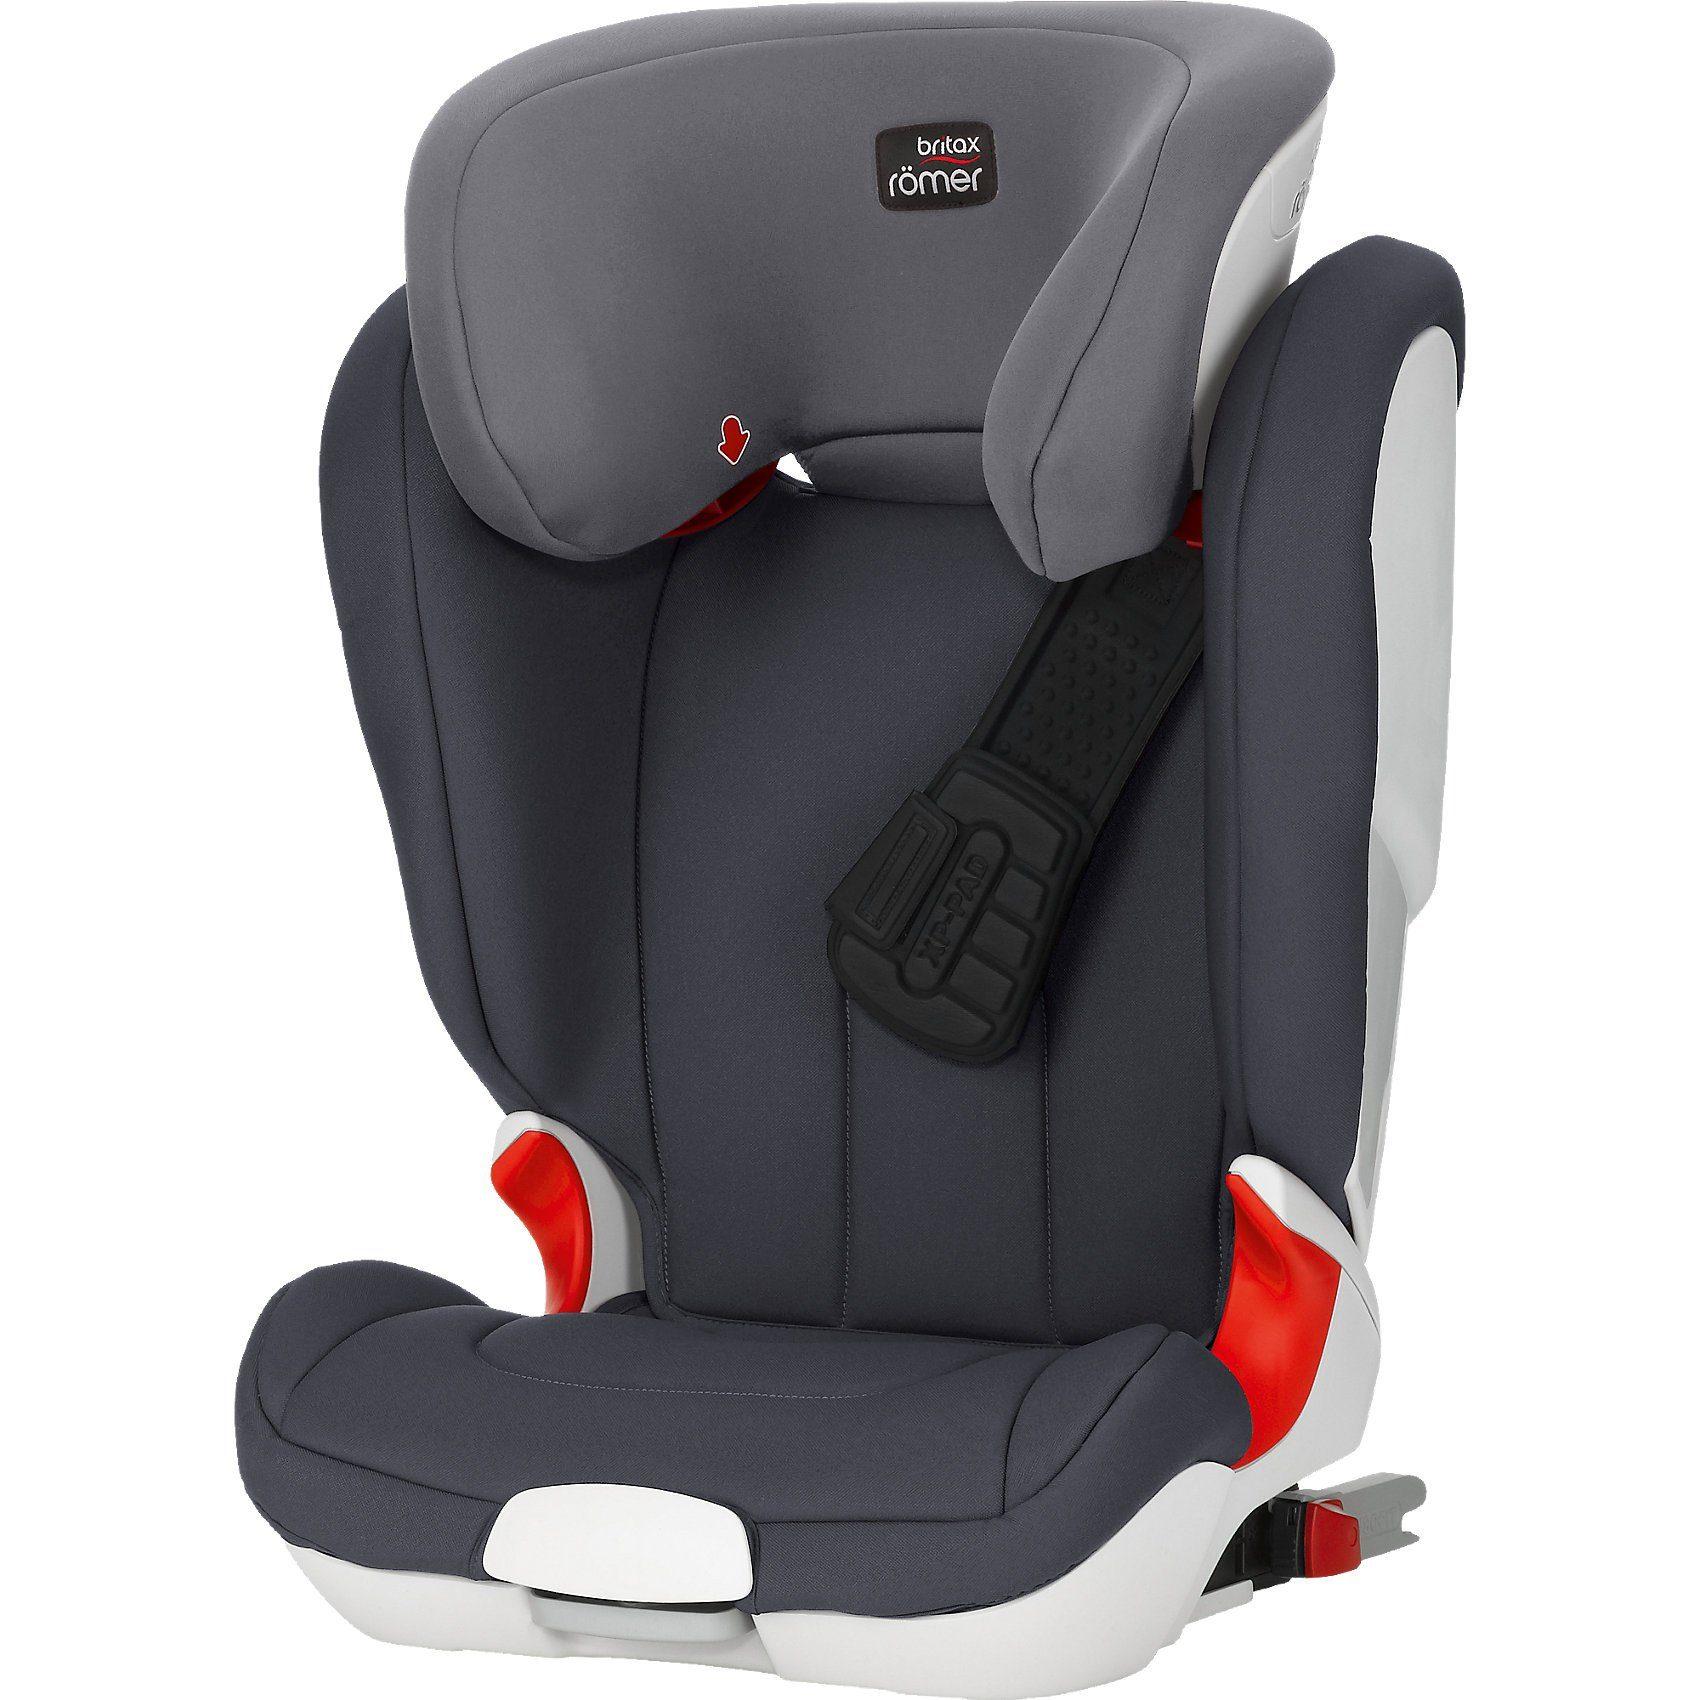 BRITAX RÖMER Auto-Kindersitz Kidfix XP, Storm Grey, 2018